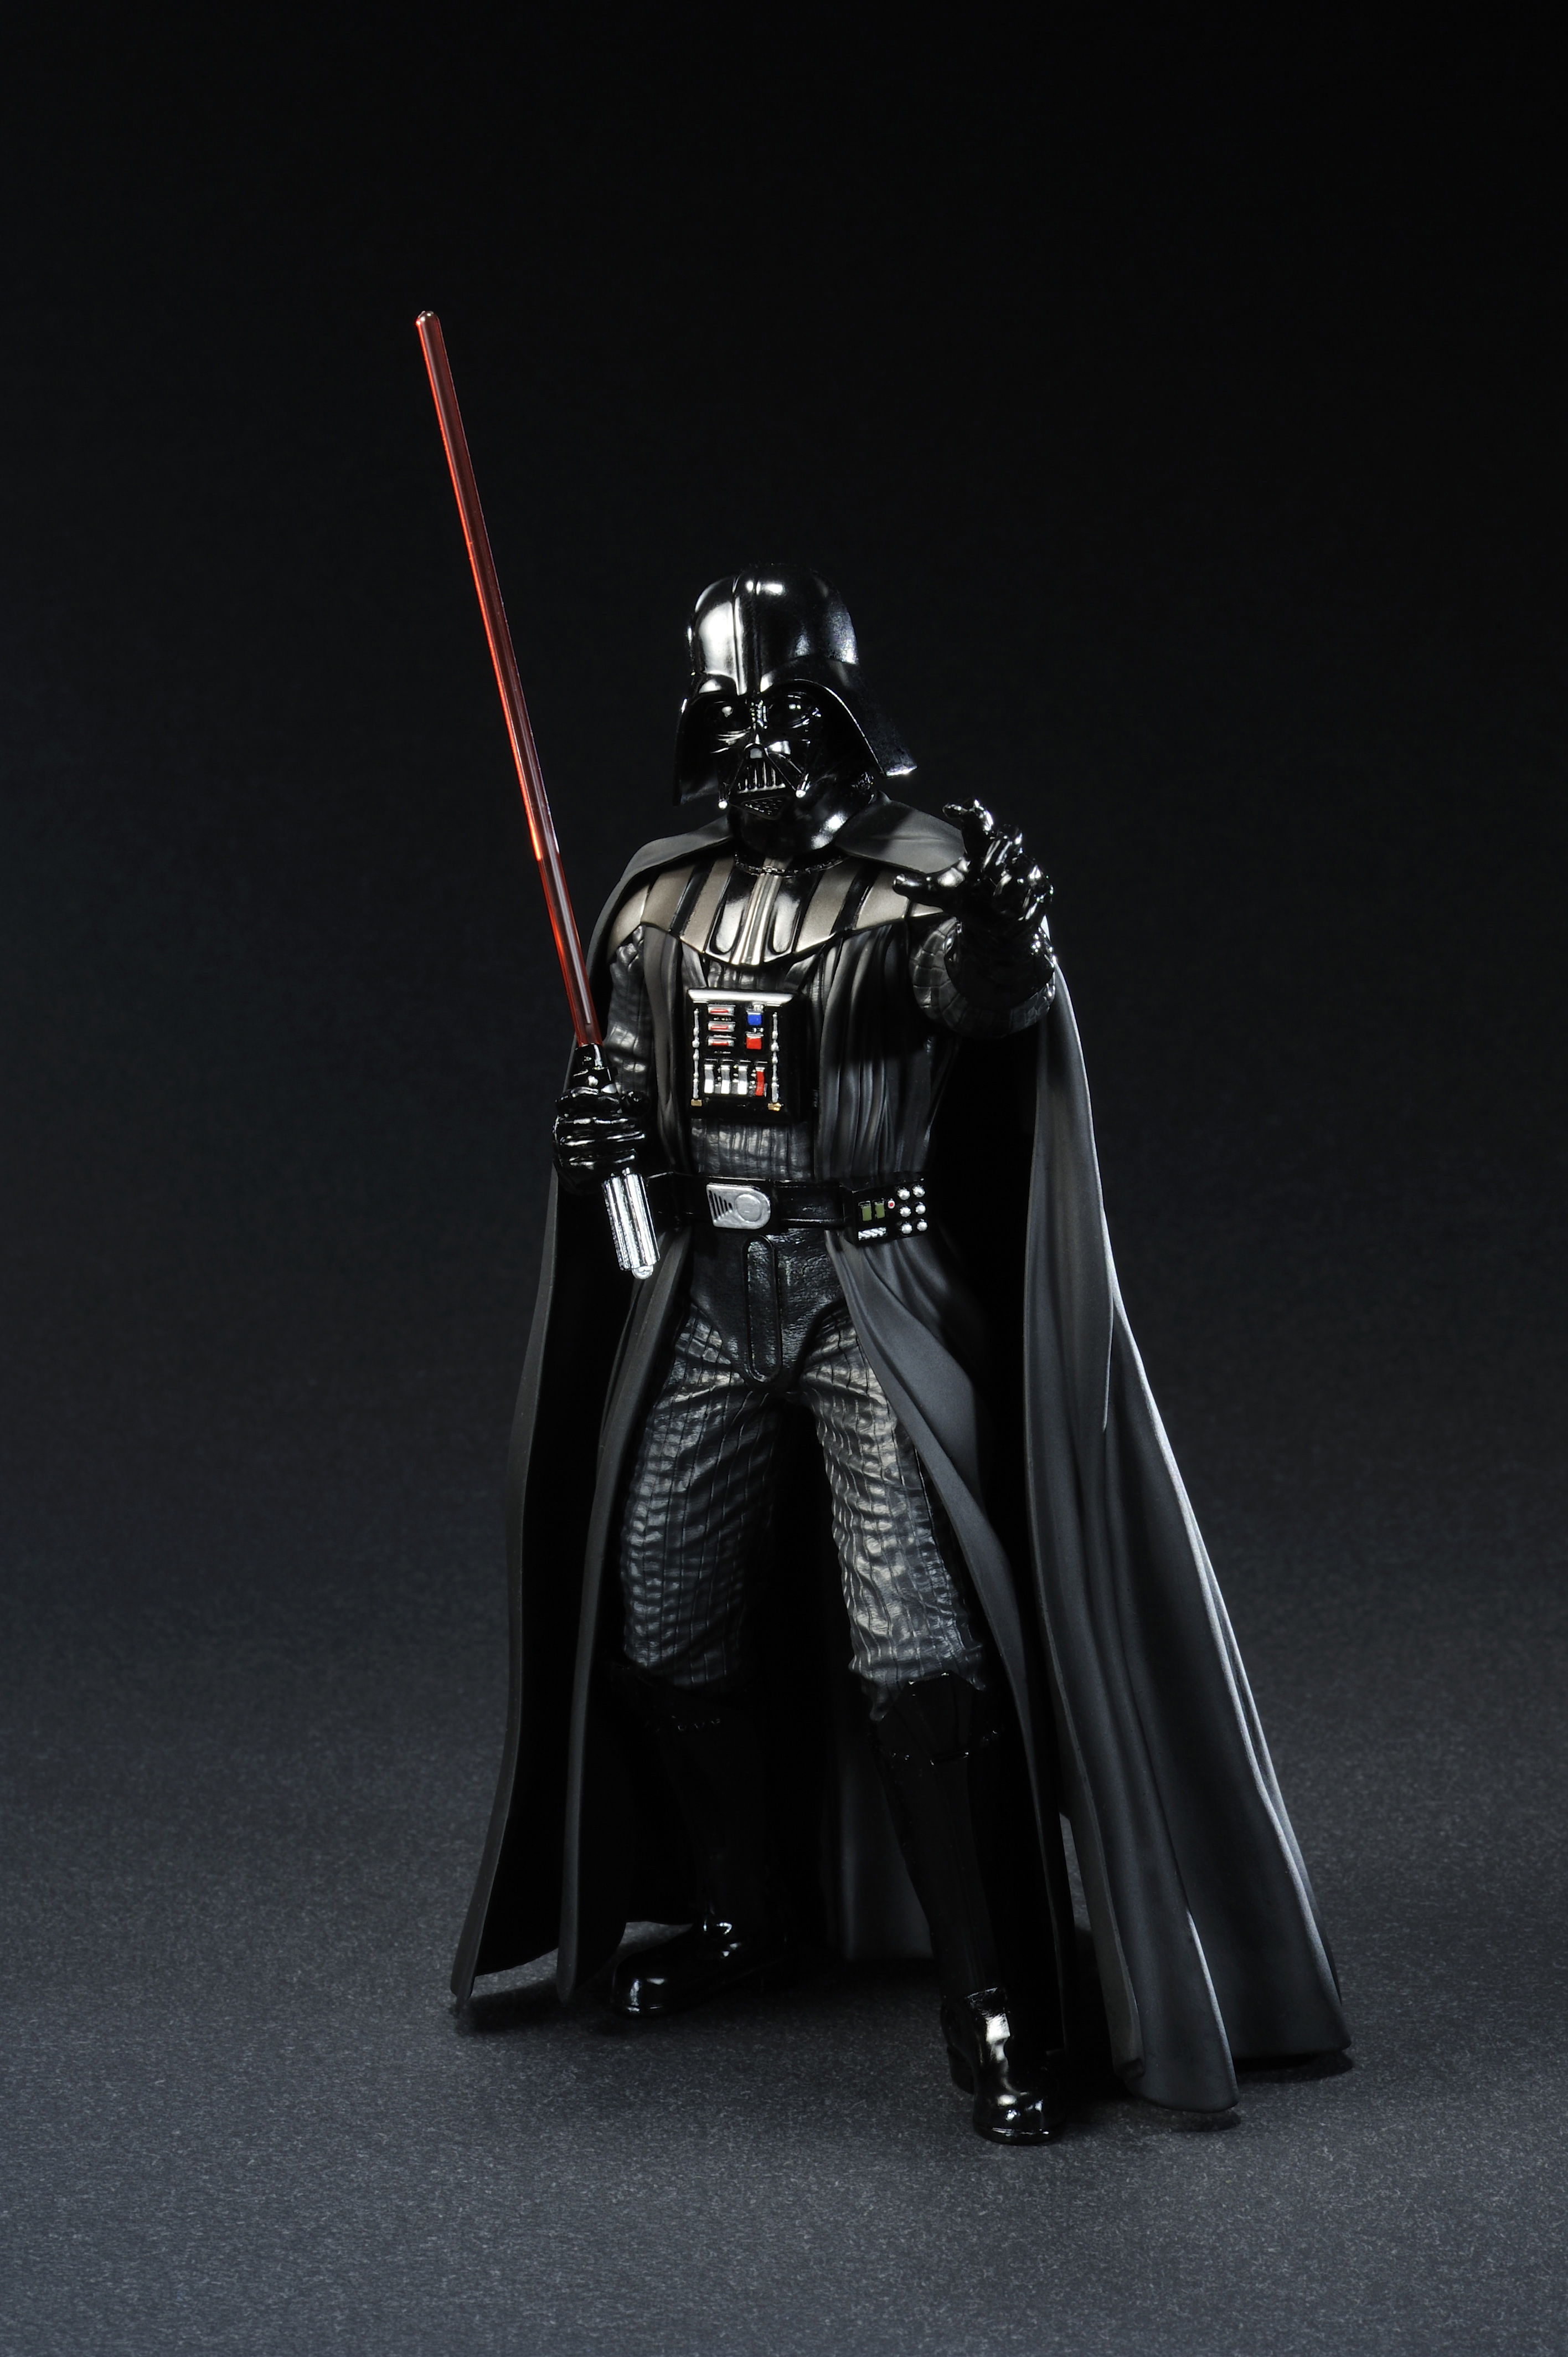 Kotobukiya SW133 Star Wars Darth Vader Return of Anakin Skywalker Art FX